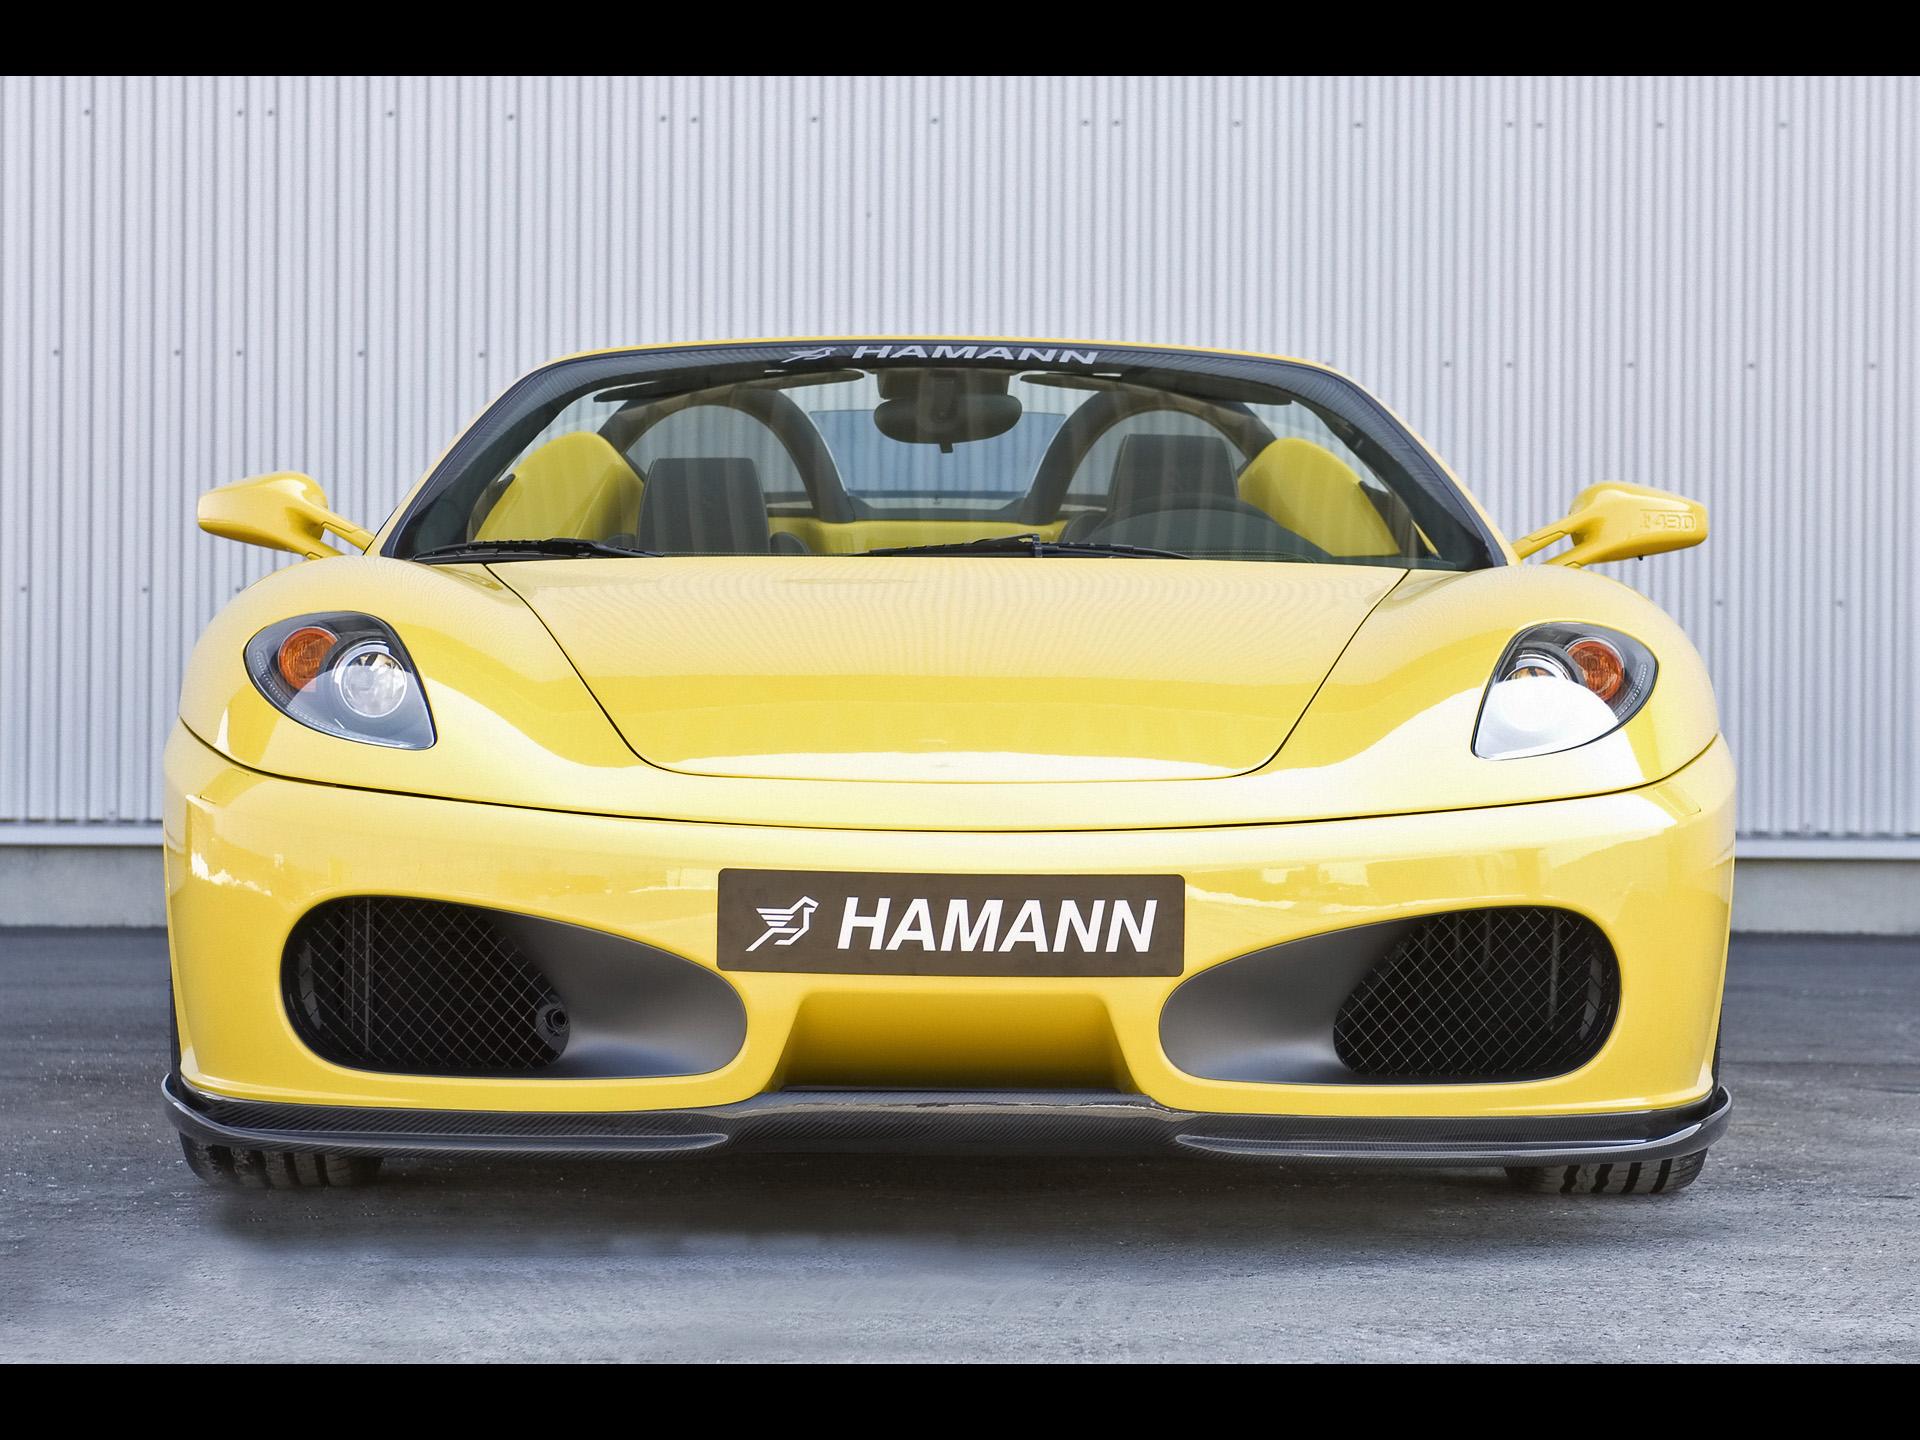 Hamann Ferrari F430 Picture 33040 Hamann Photo Gallery Carsbasecom